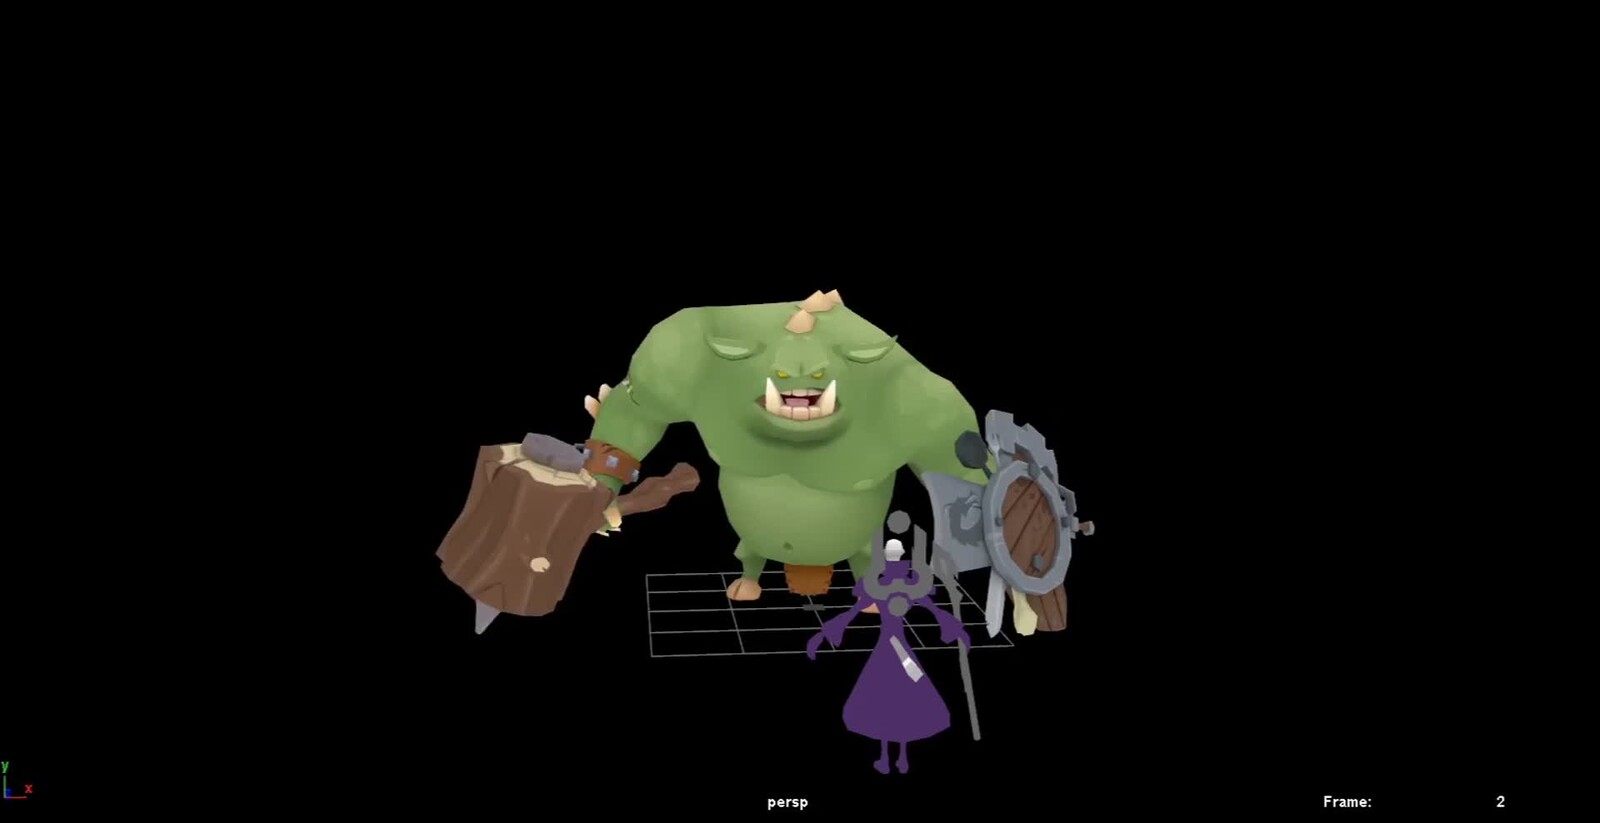 Ogre for unreleased mobile title.